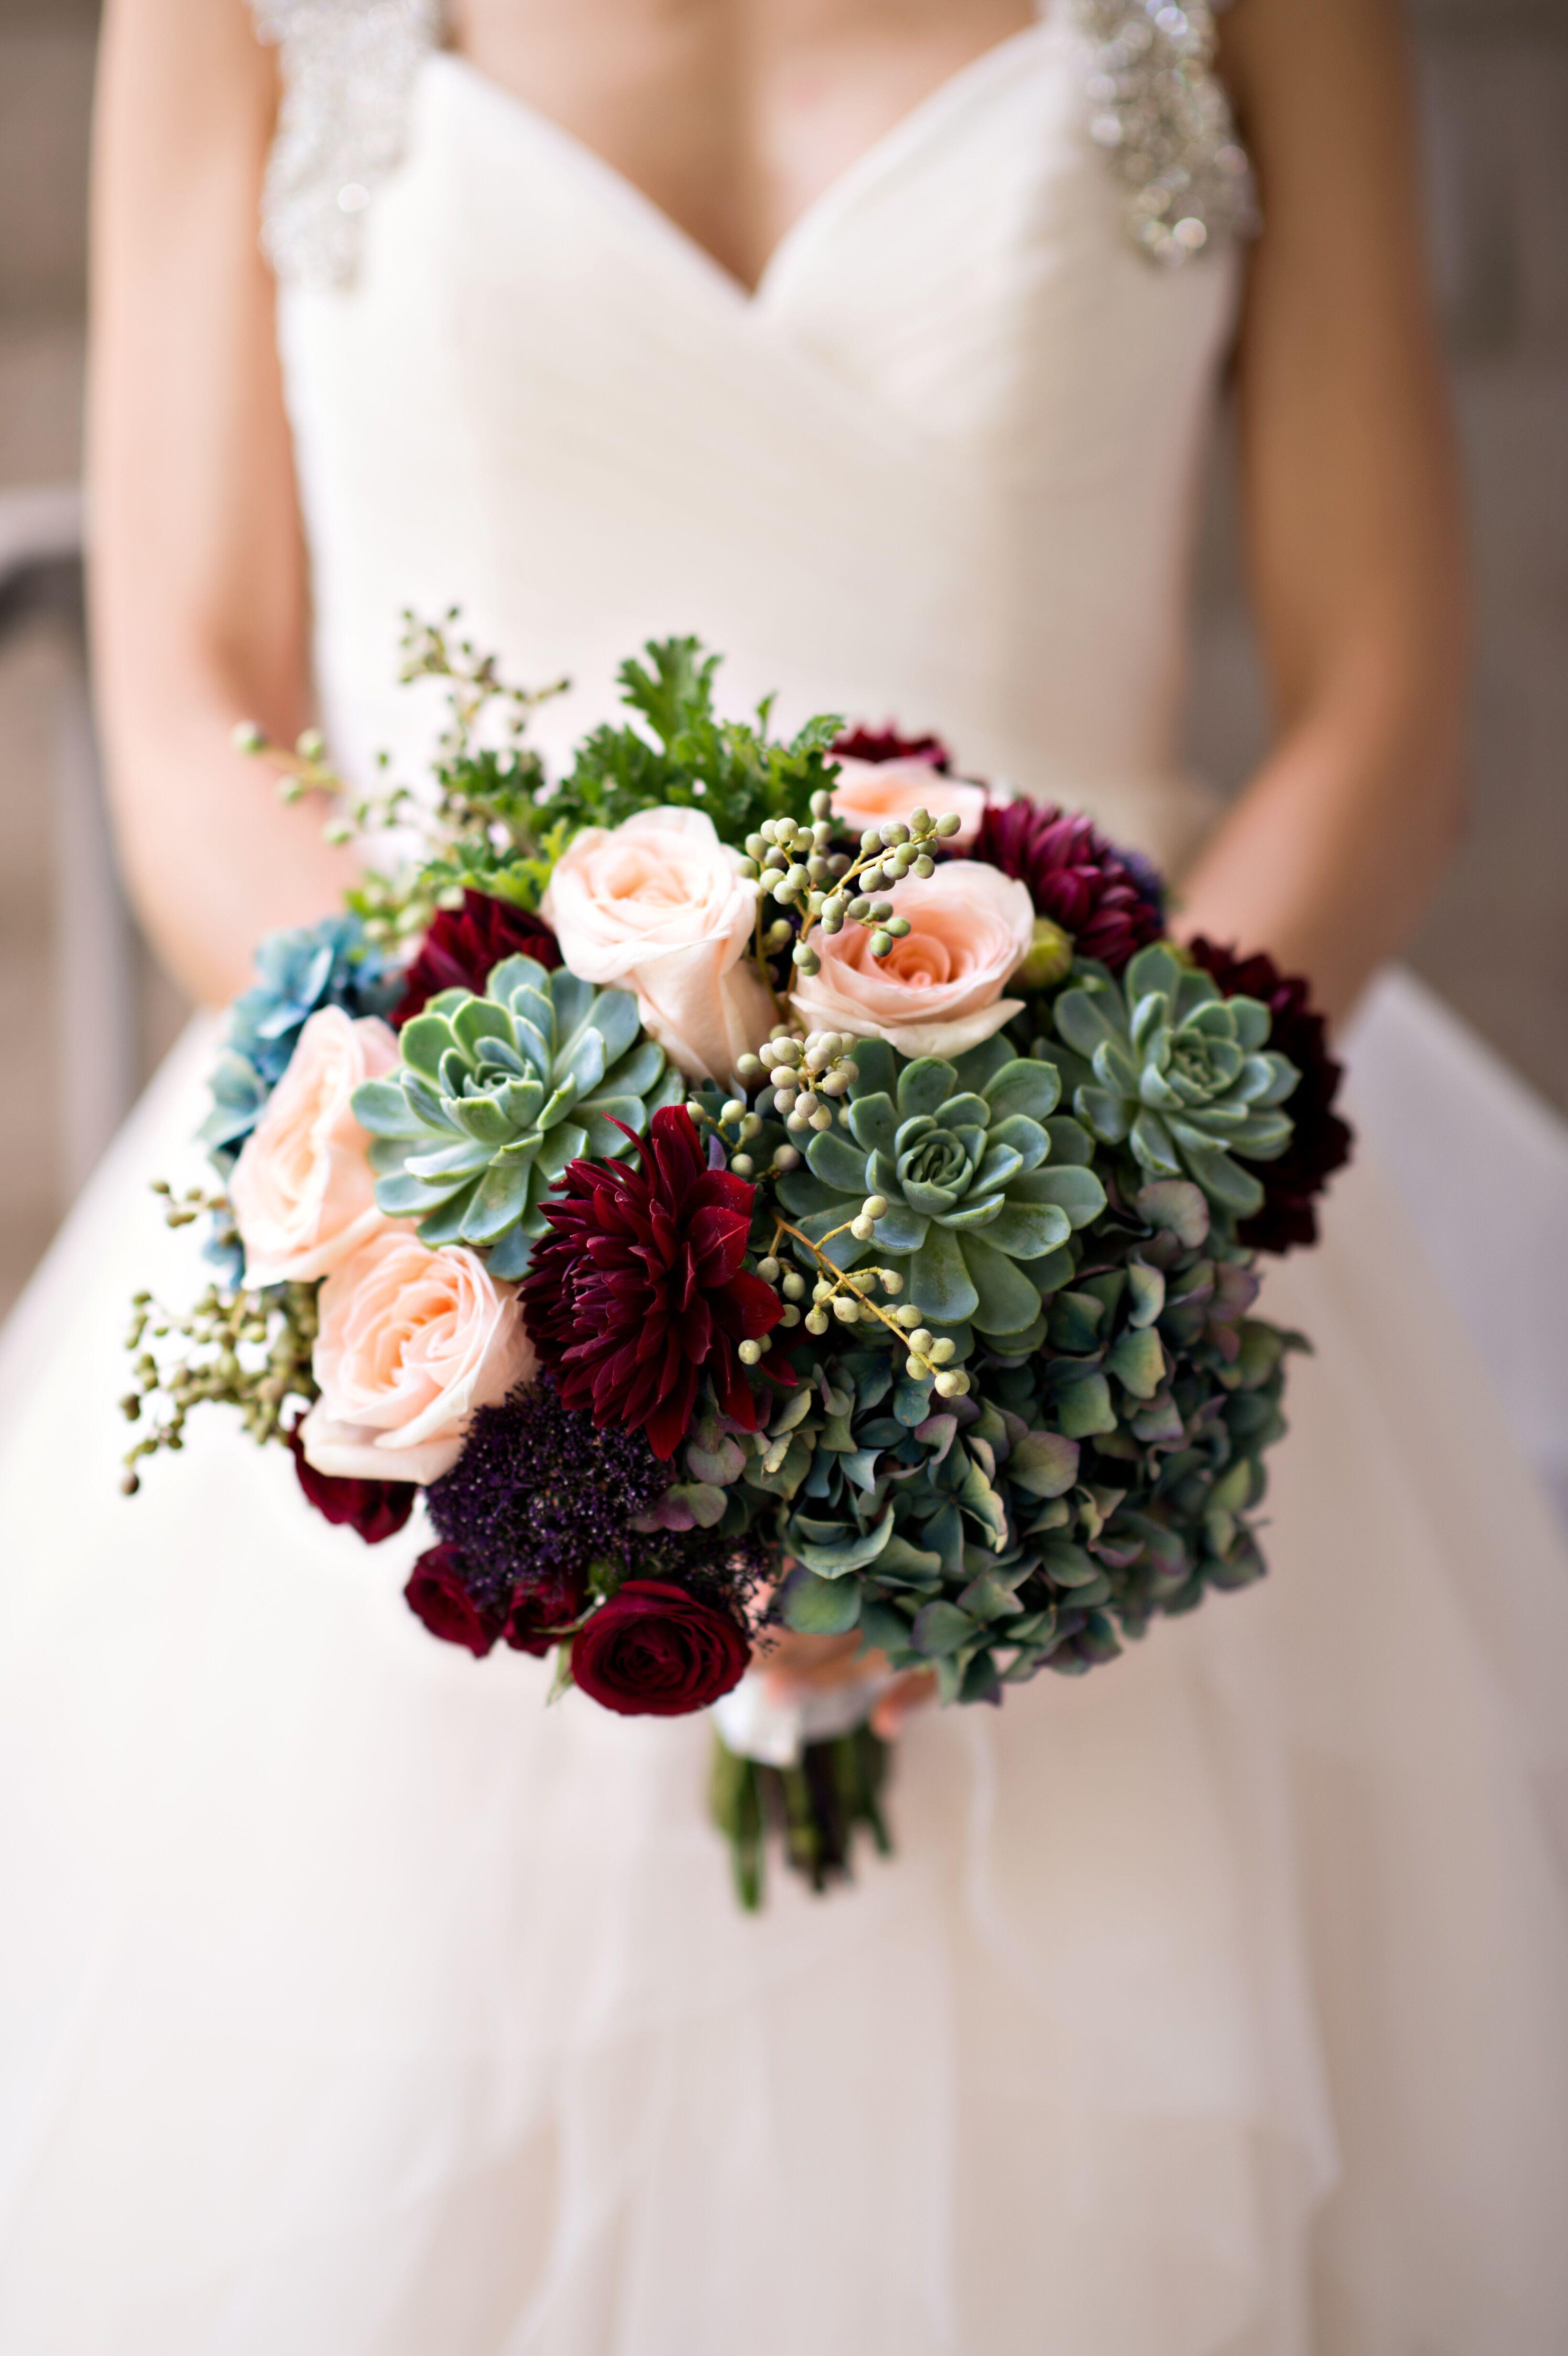 Romantic Succulent Rose And Dahlia Bouquet